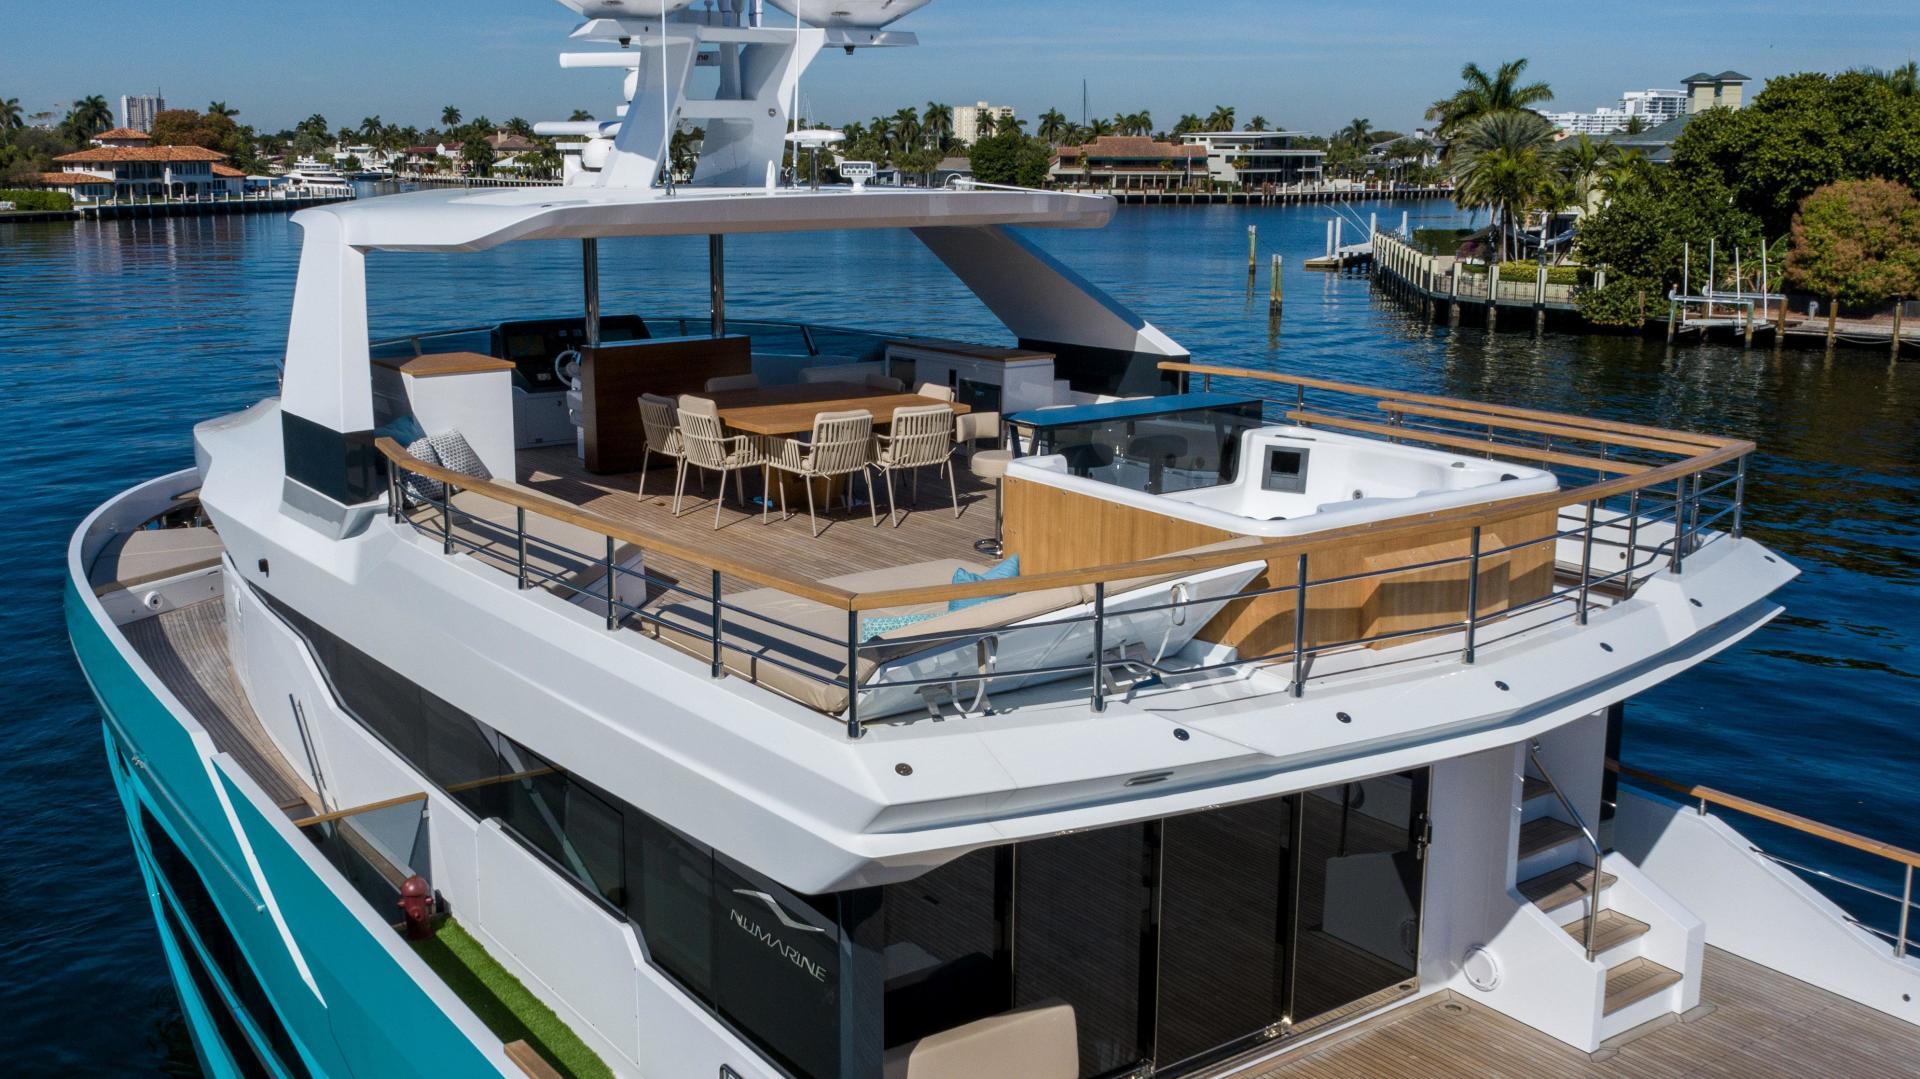 Numarine-32XP 2020-7 Diamonds Fort Lauderdale-Florida-United States-1629338 | Thumbnail